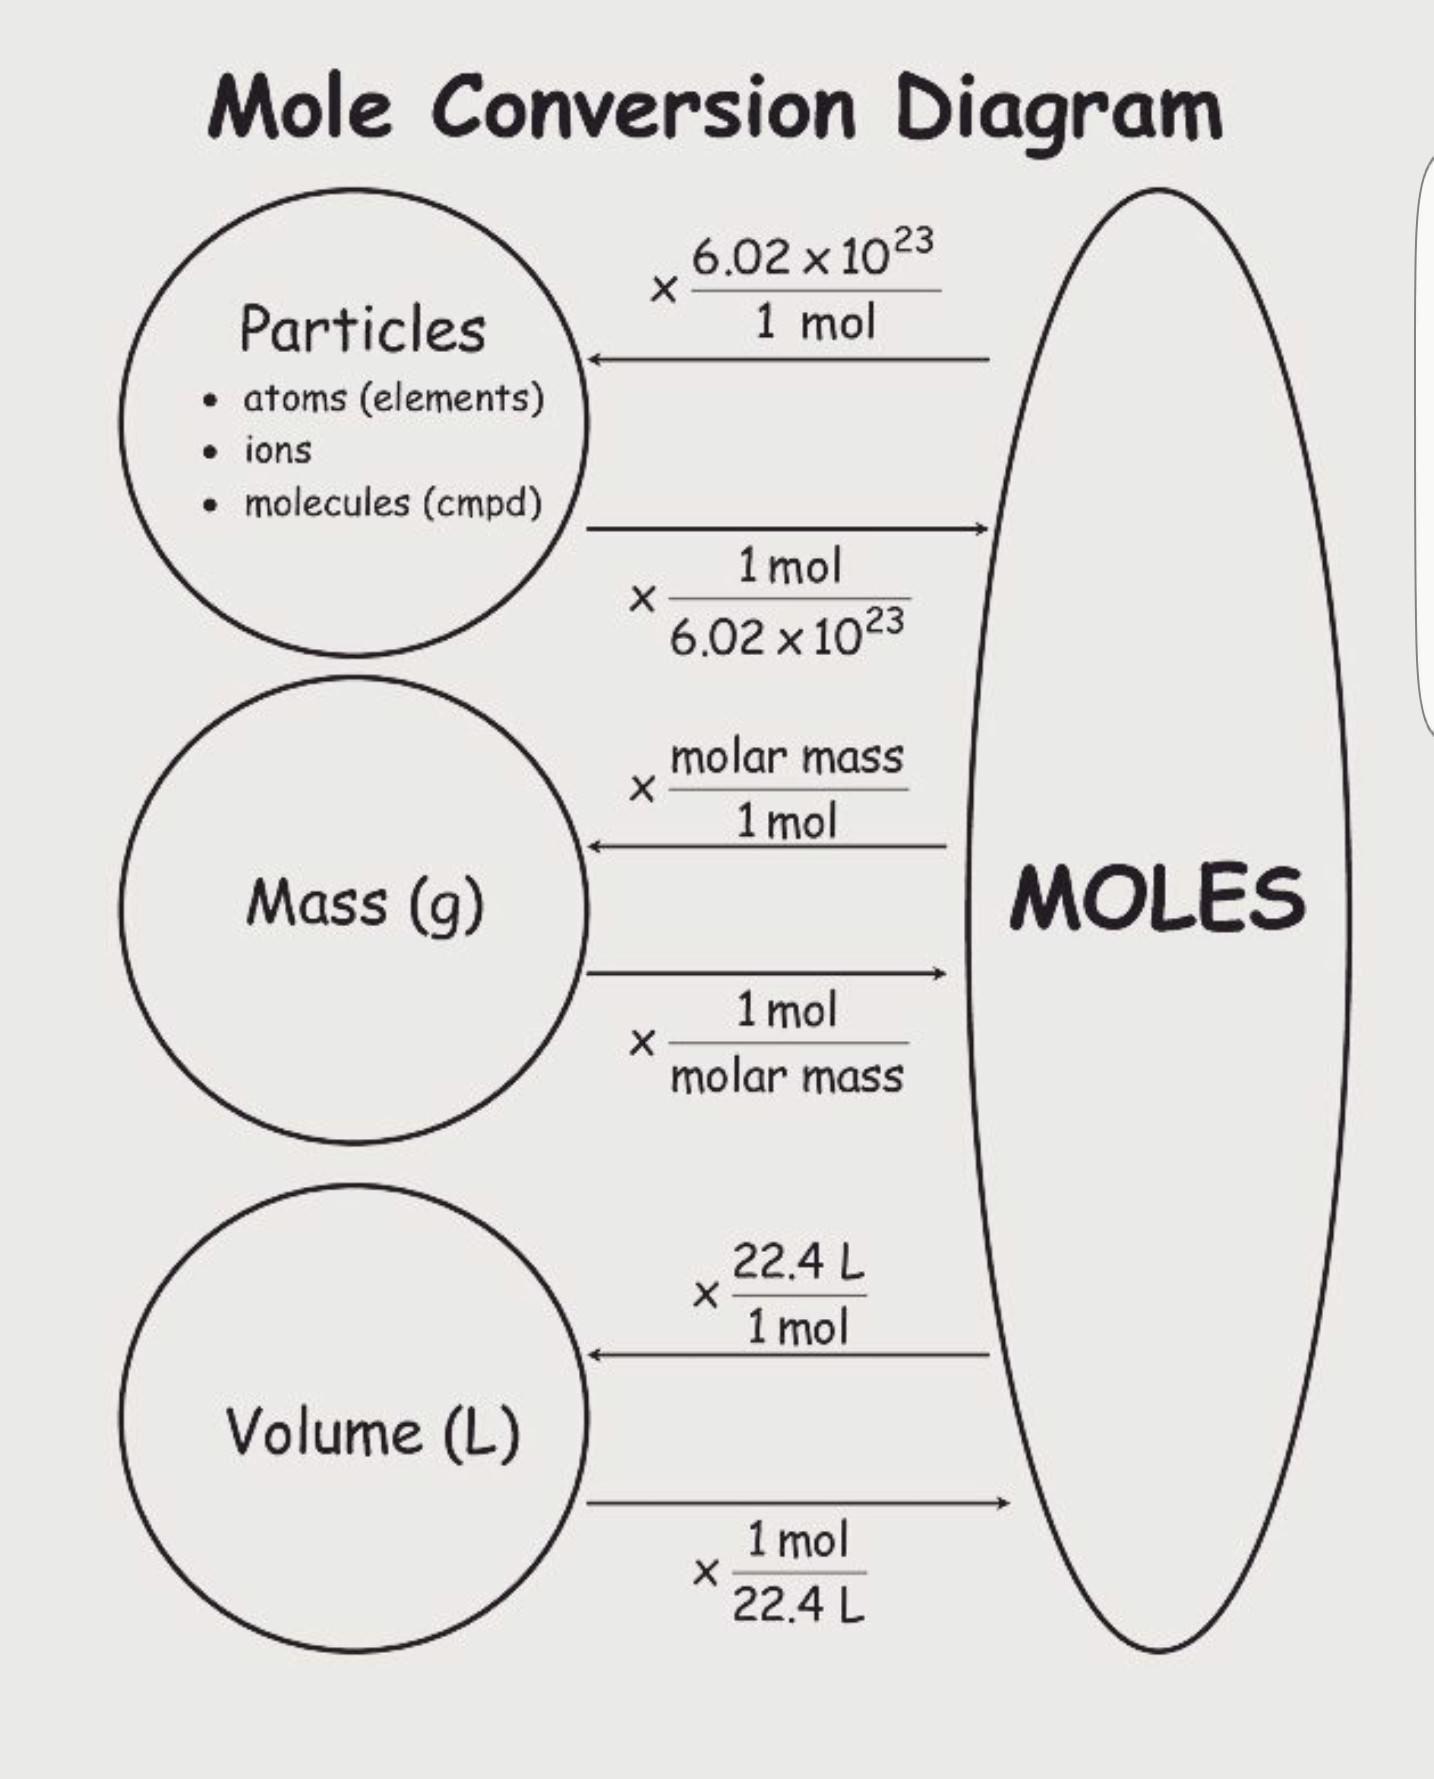 Diagramme De Conversion De La Mole